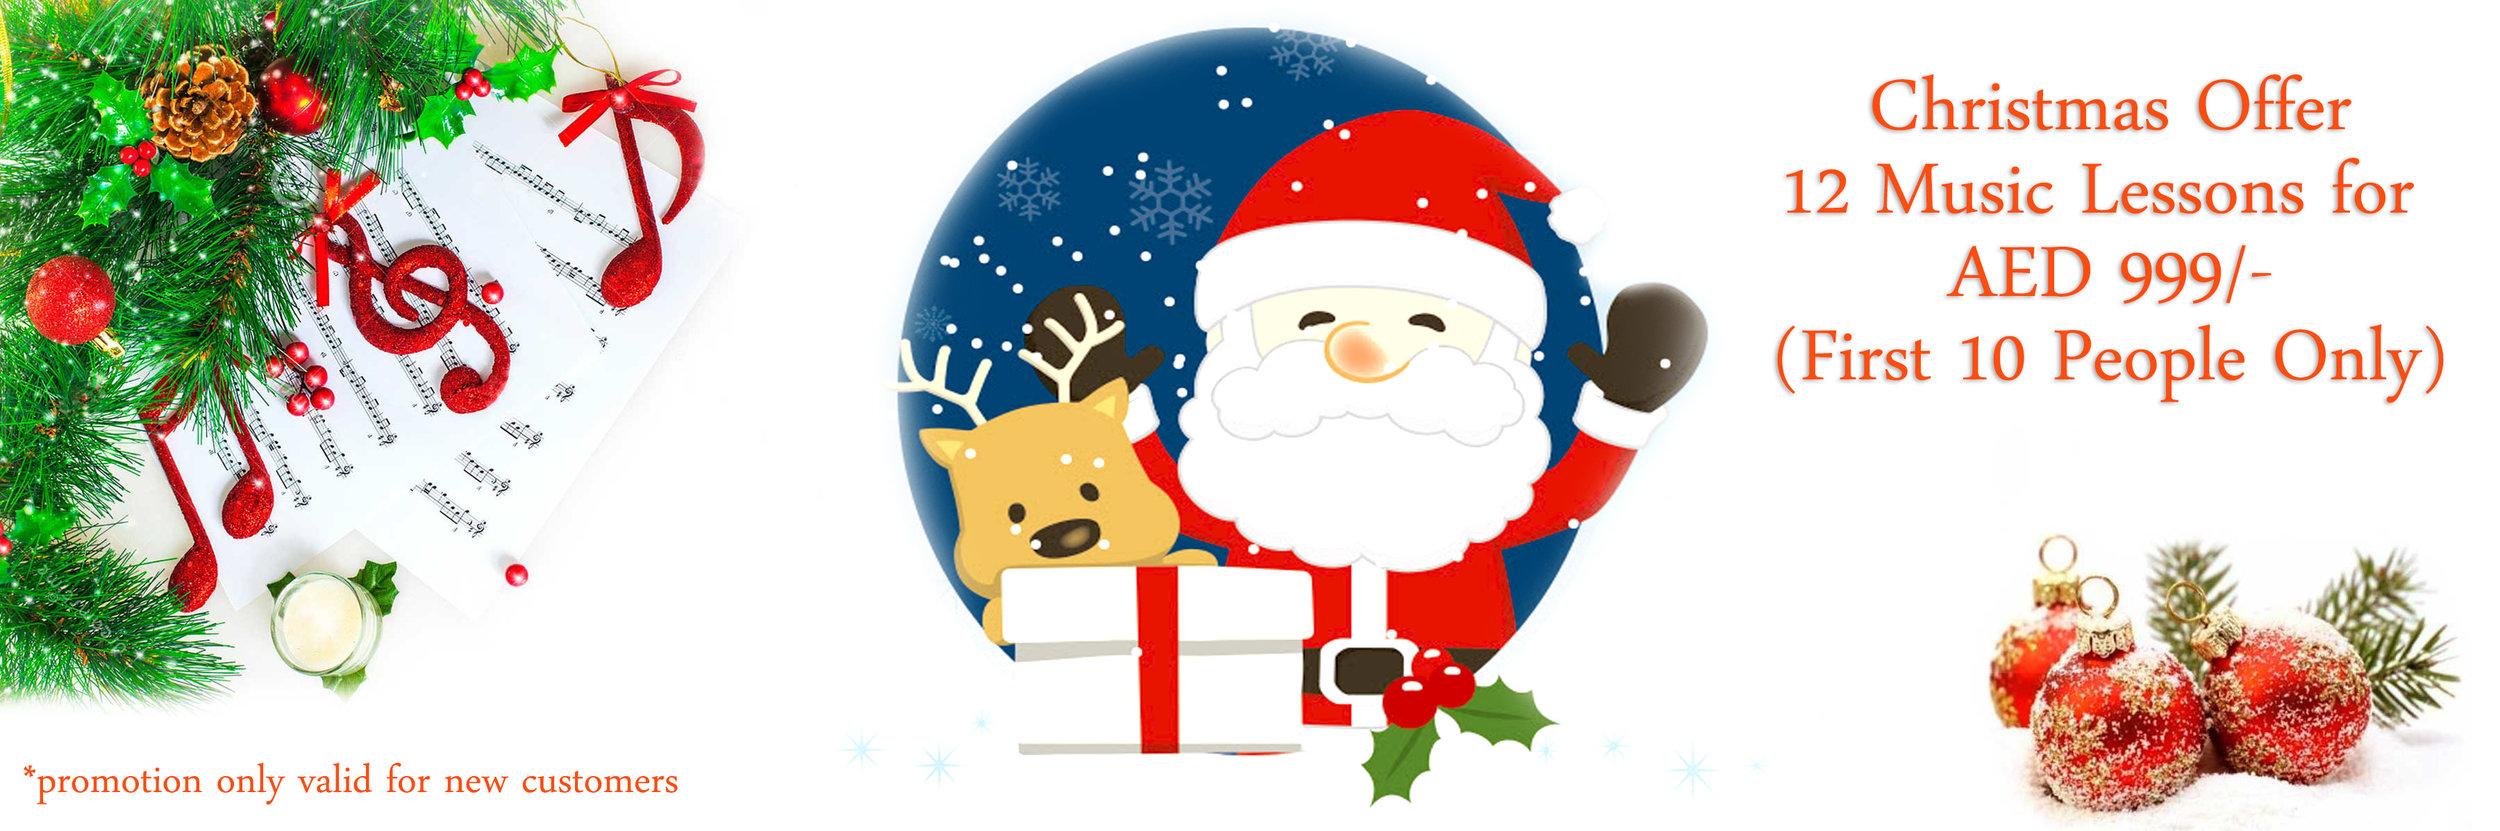 Christmas-promo-2.jpg